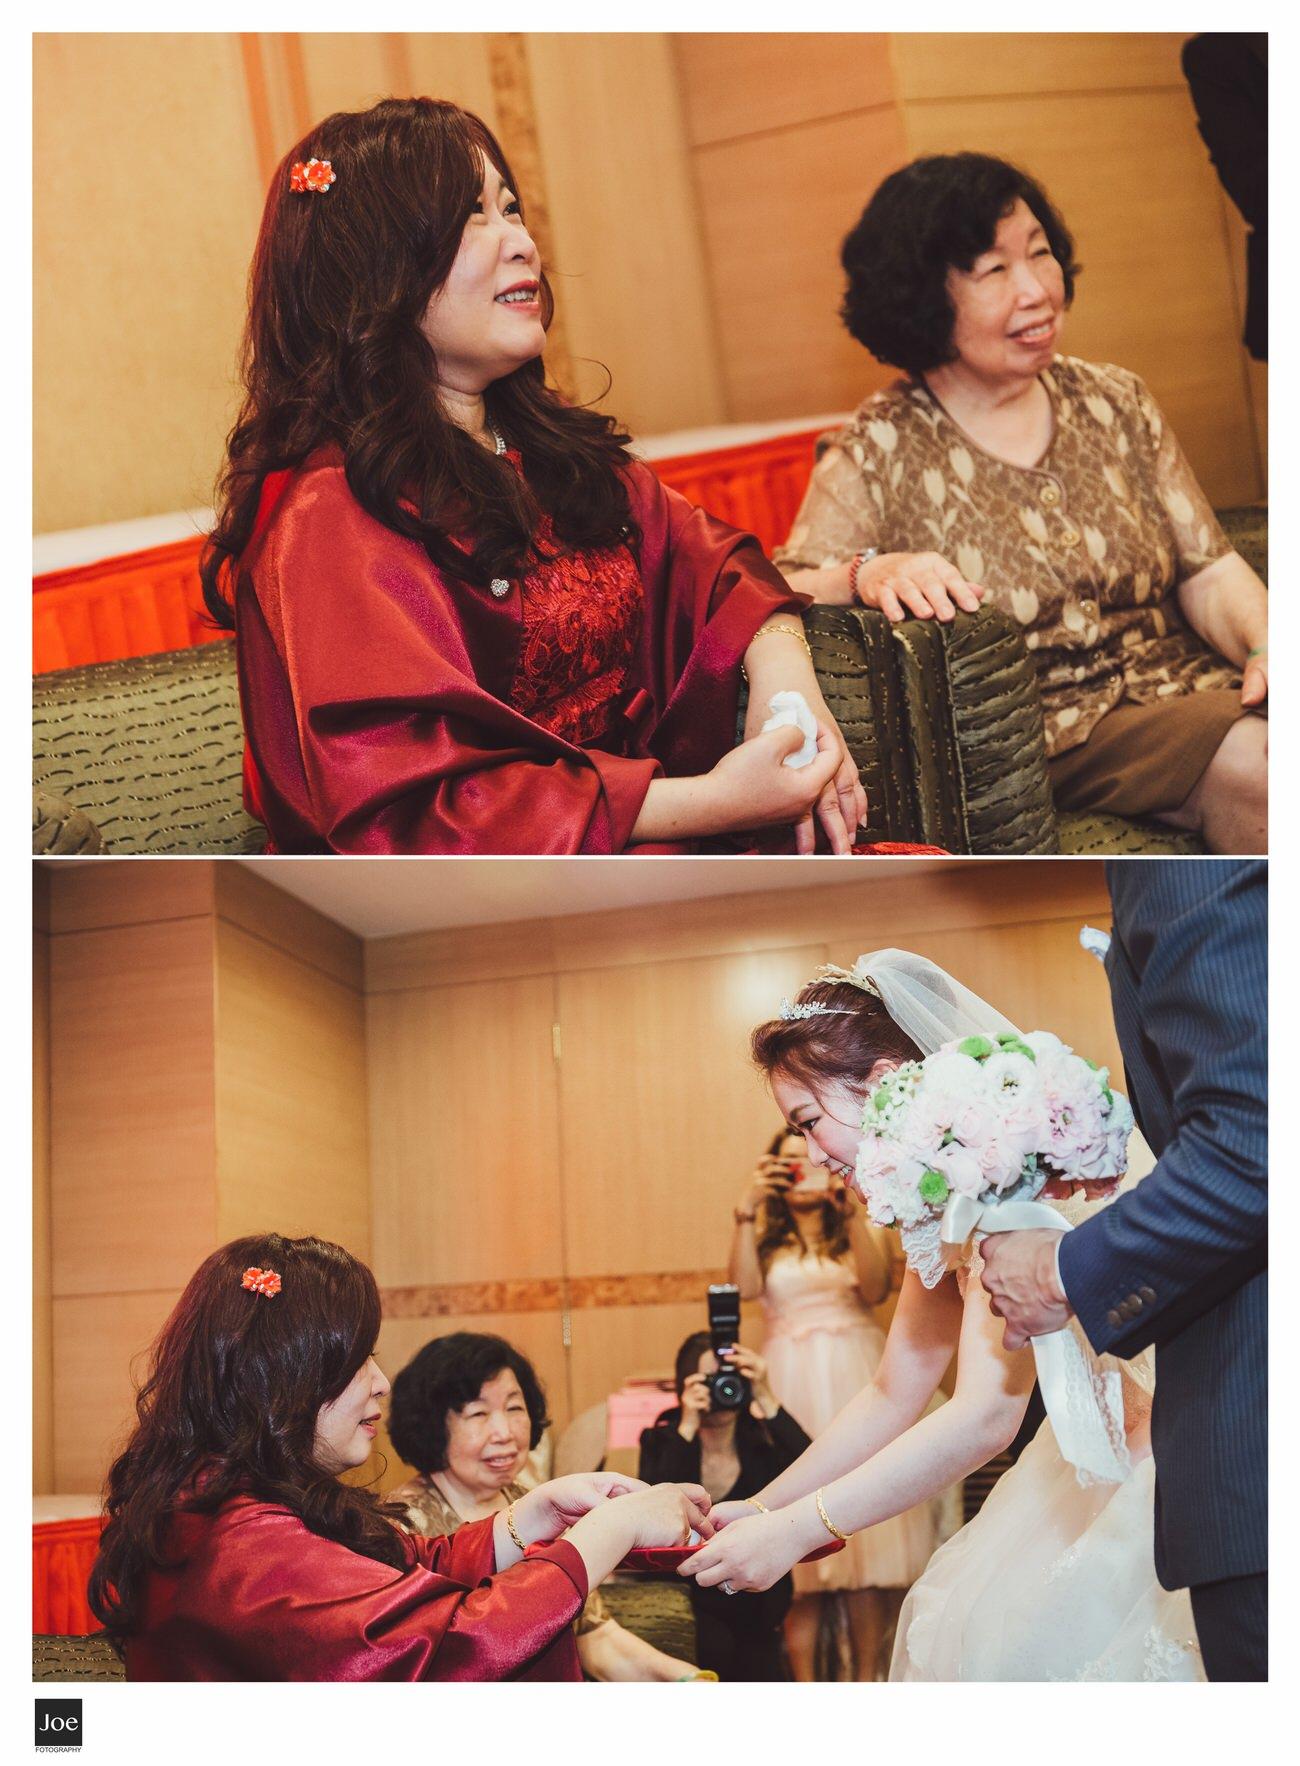 sunworld-dynasty-hotel-taipei-wedding-photo-joe-fotography-angel-jay-043.jpg